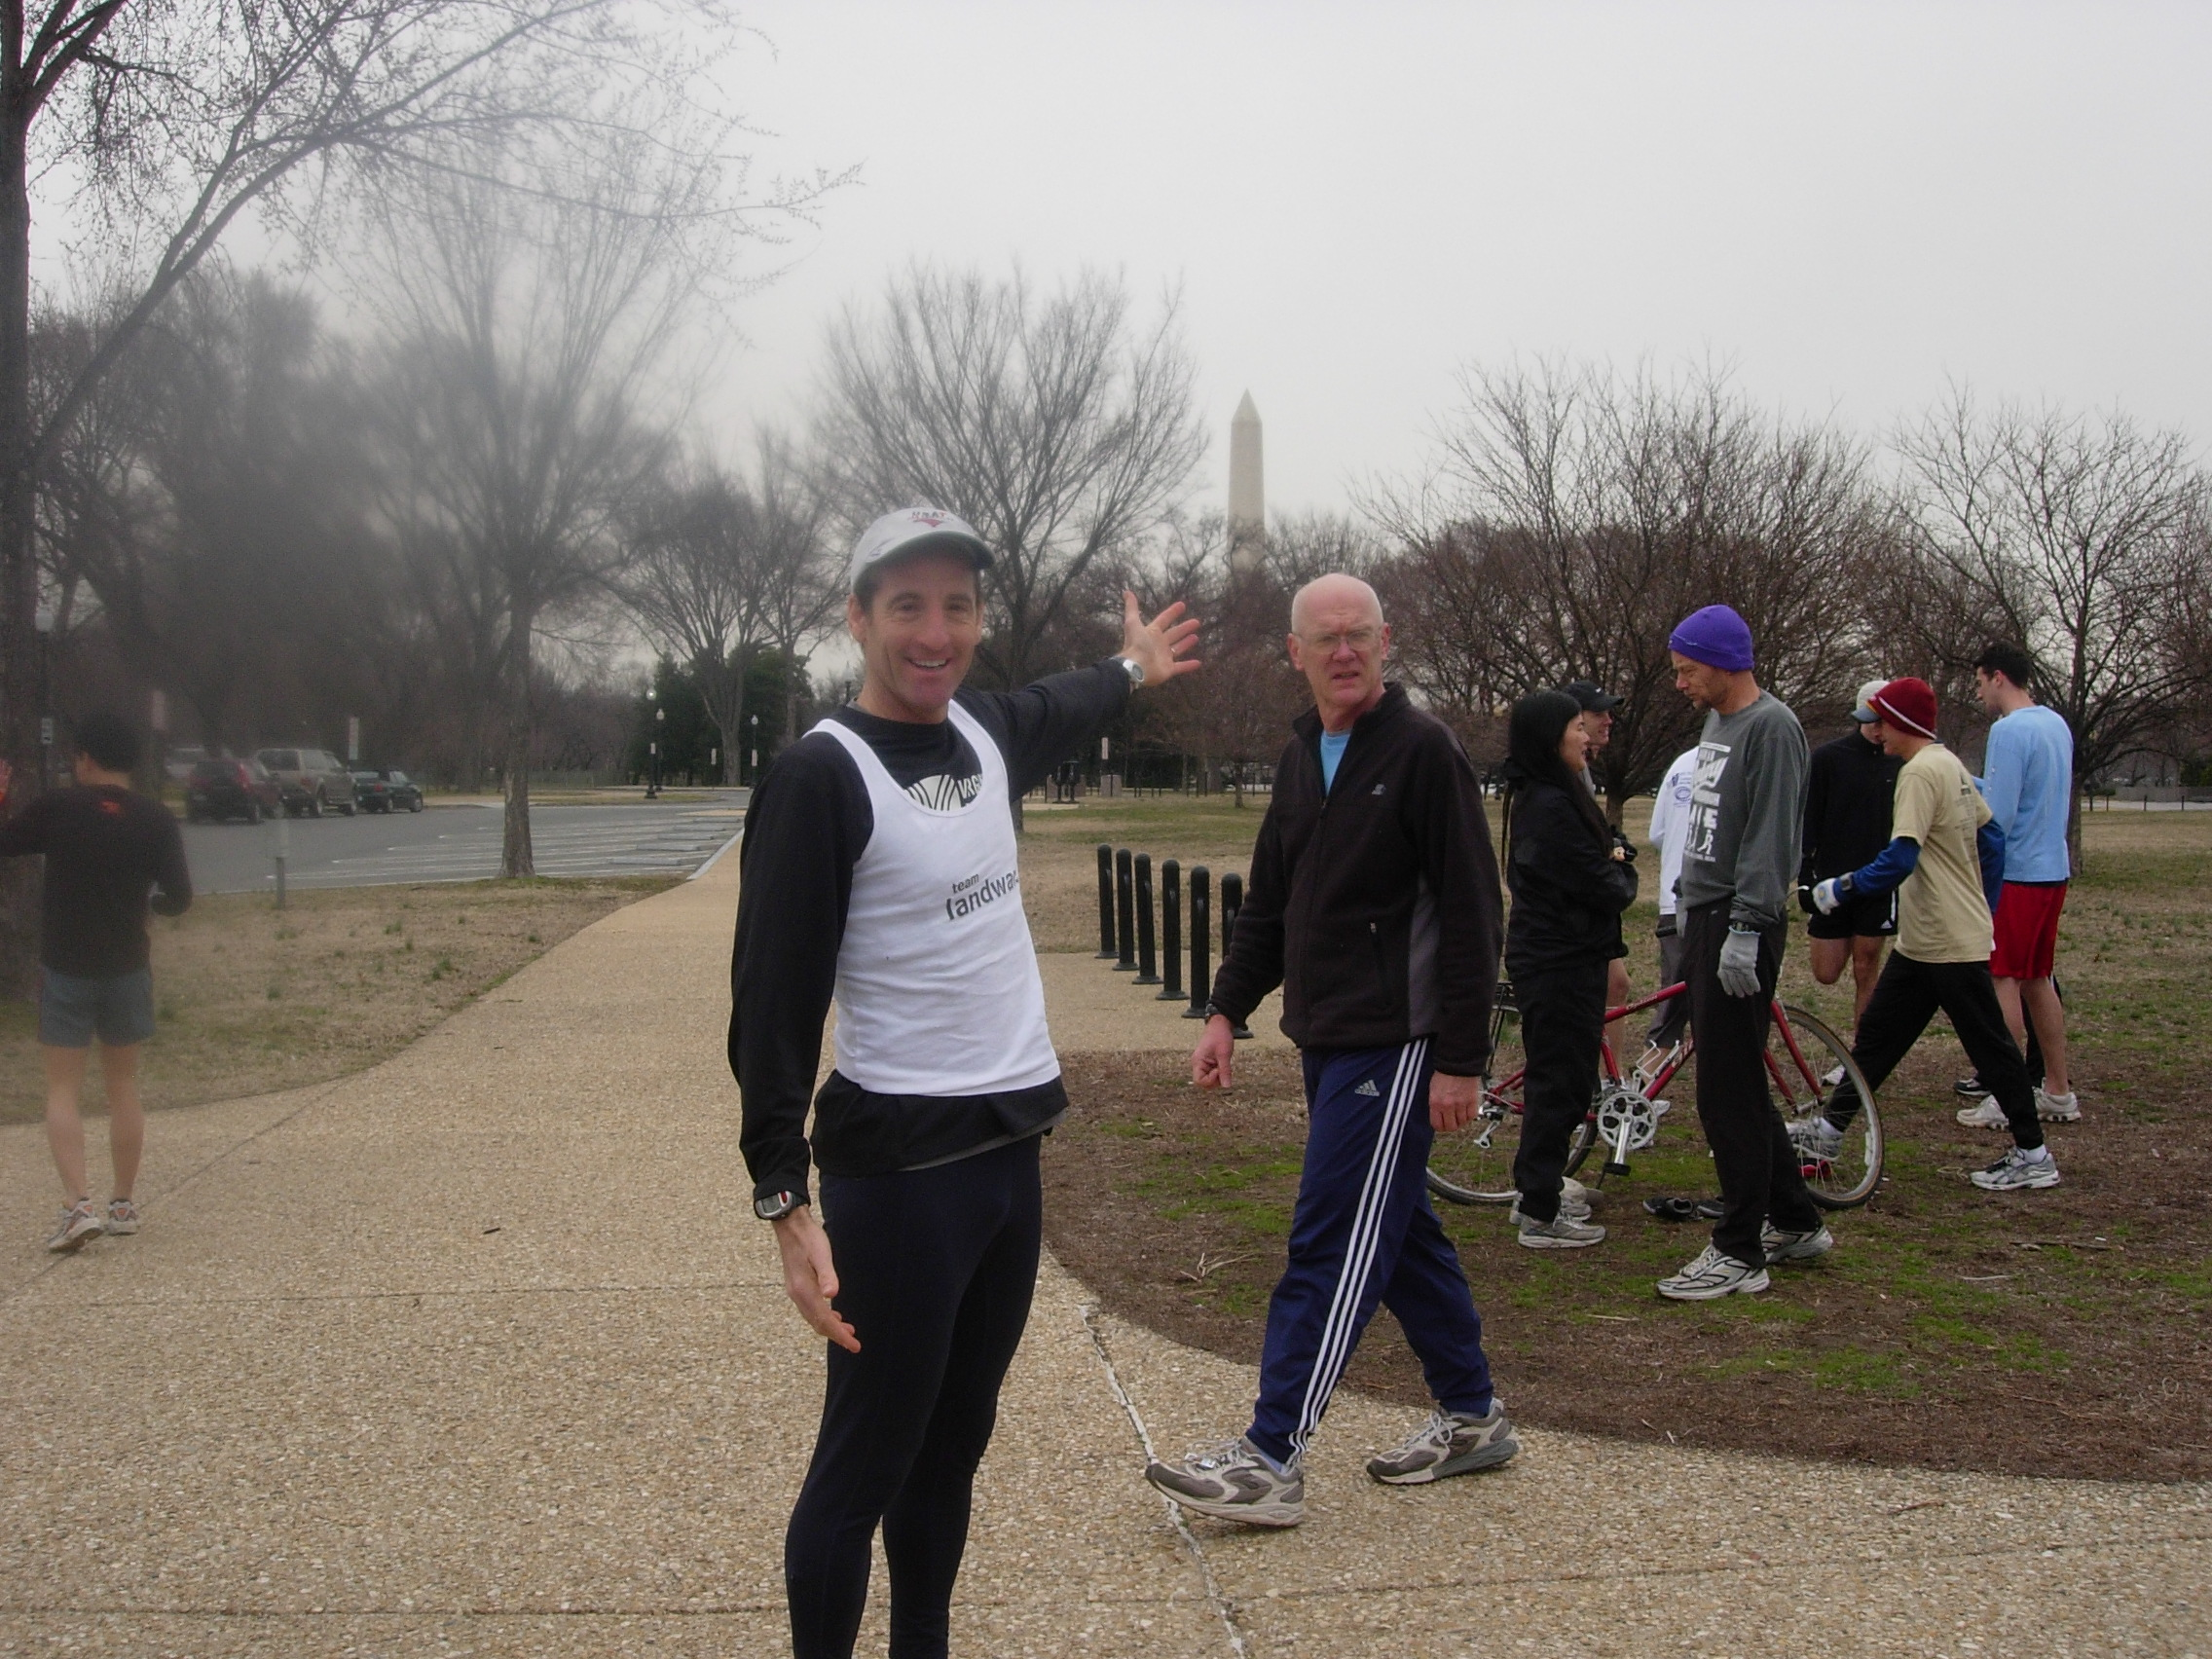 Doug Landau showing the Tidal Basin 3km. starting line with the Washington Monument in the background